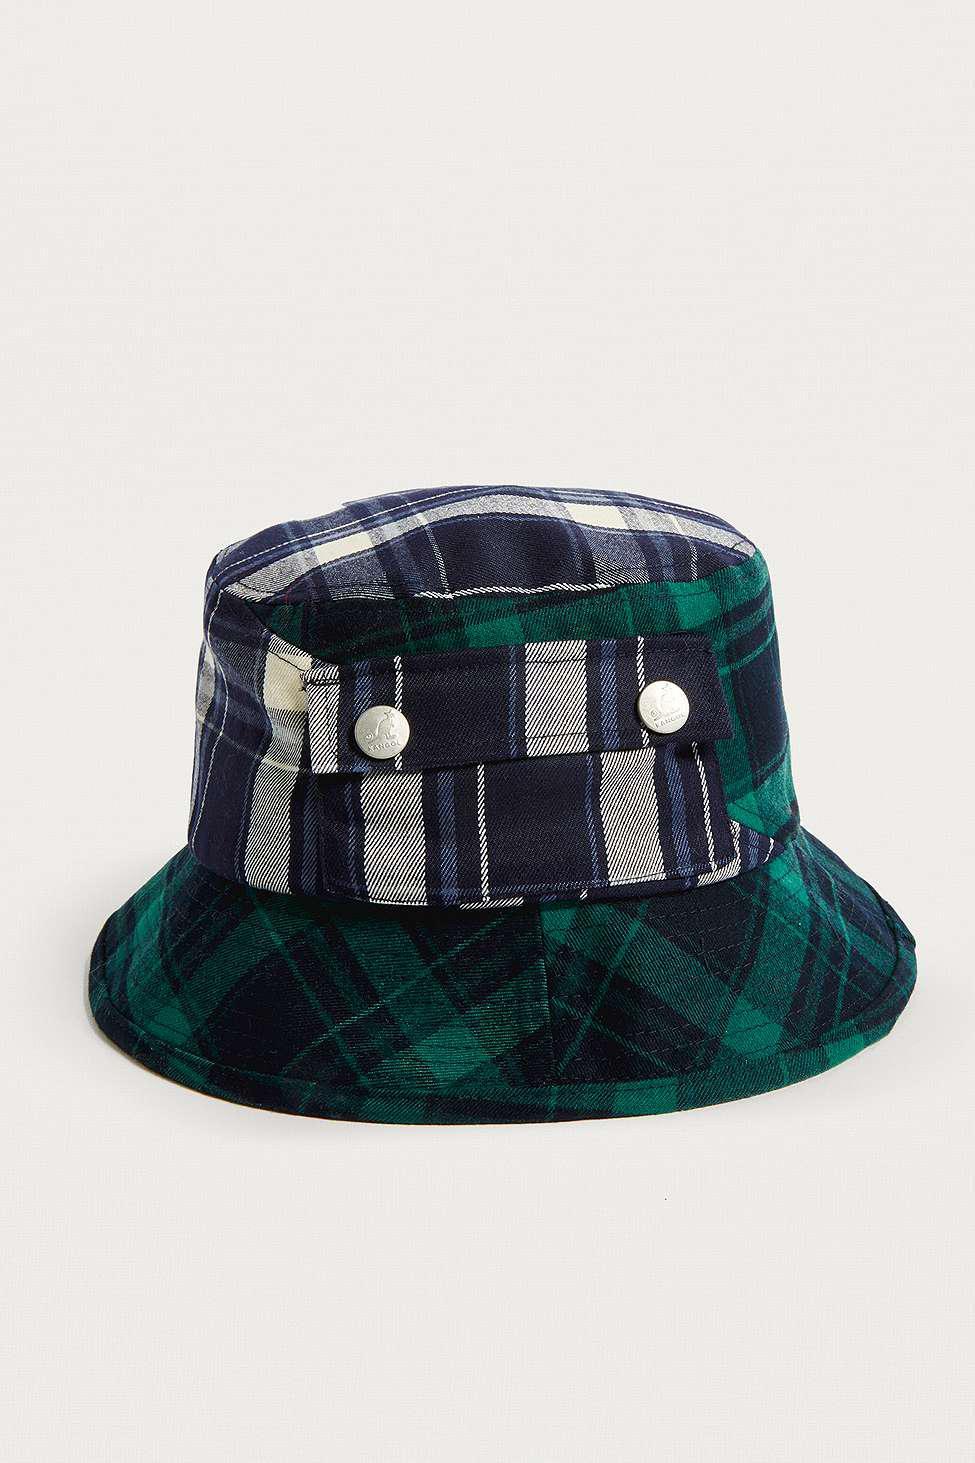 5e8178d84f5c49 Kangol Plaid On Plaid Bucket Hat - Womens M in Green - Lyst